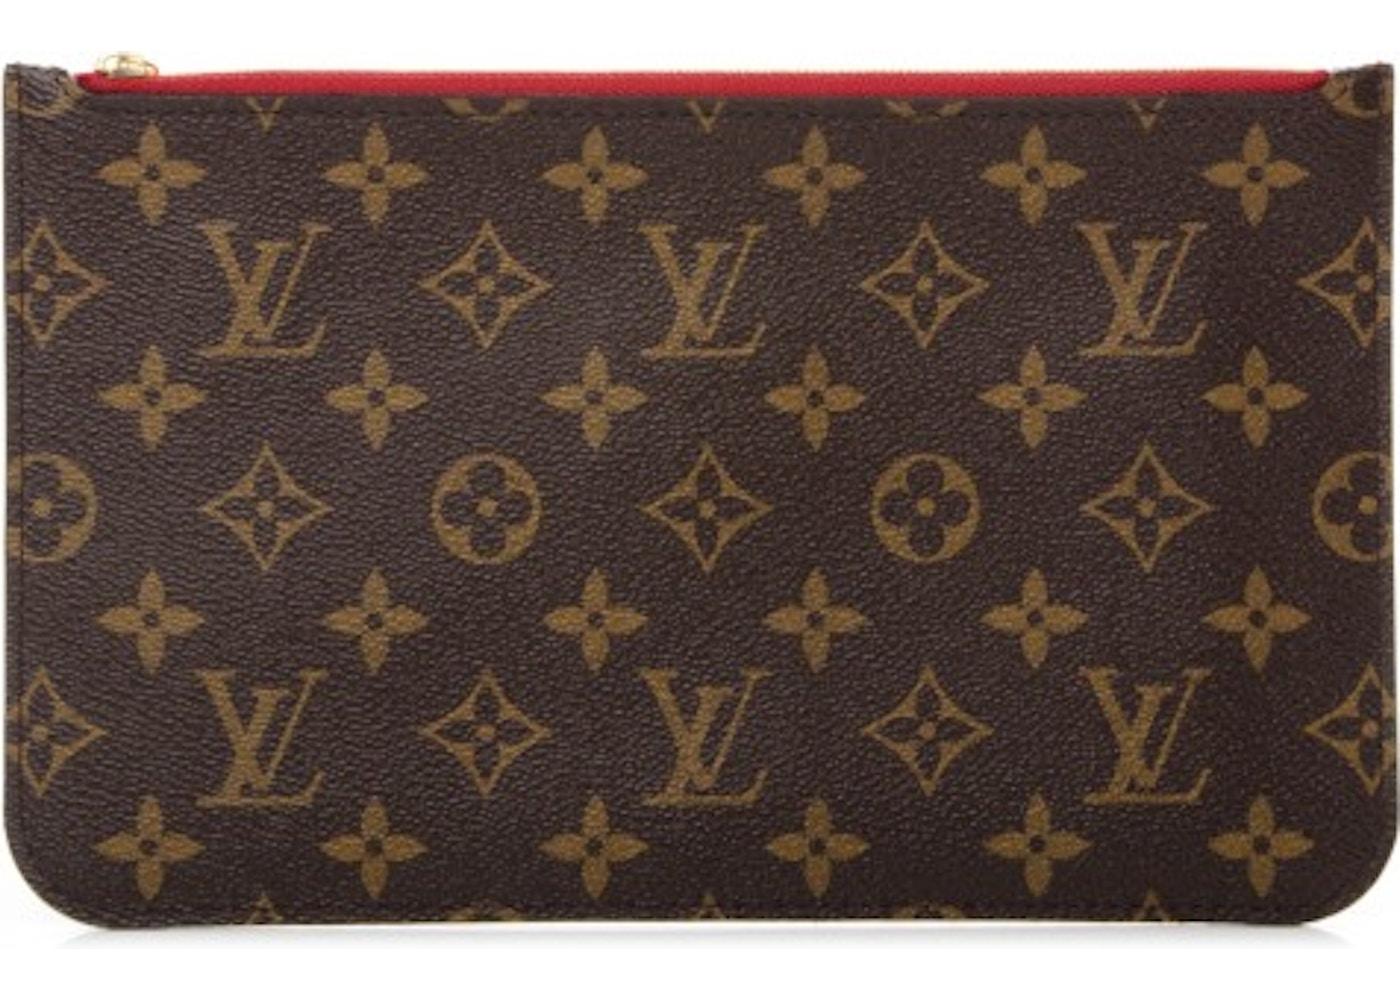 80cd4b17c0f Louis Vuitton Neverfull Pochette Monogram (Without Strap) MM/GM Cerise